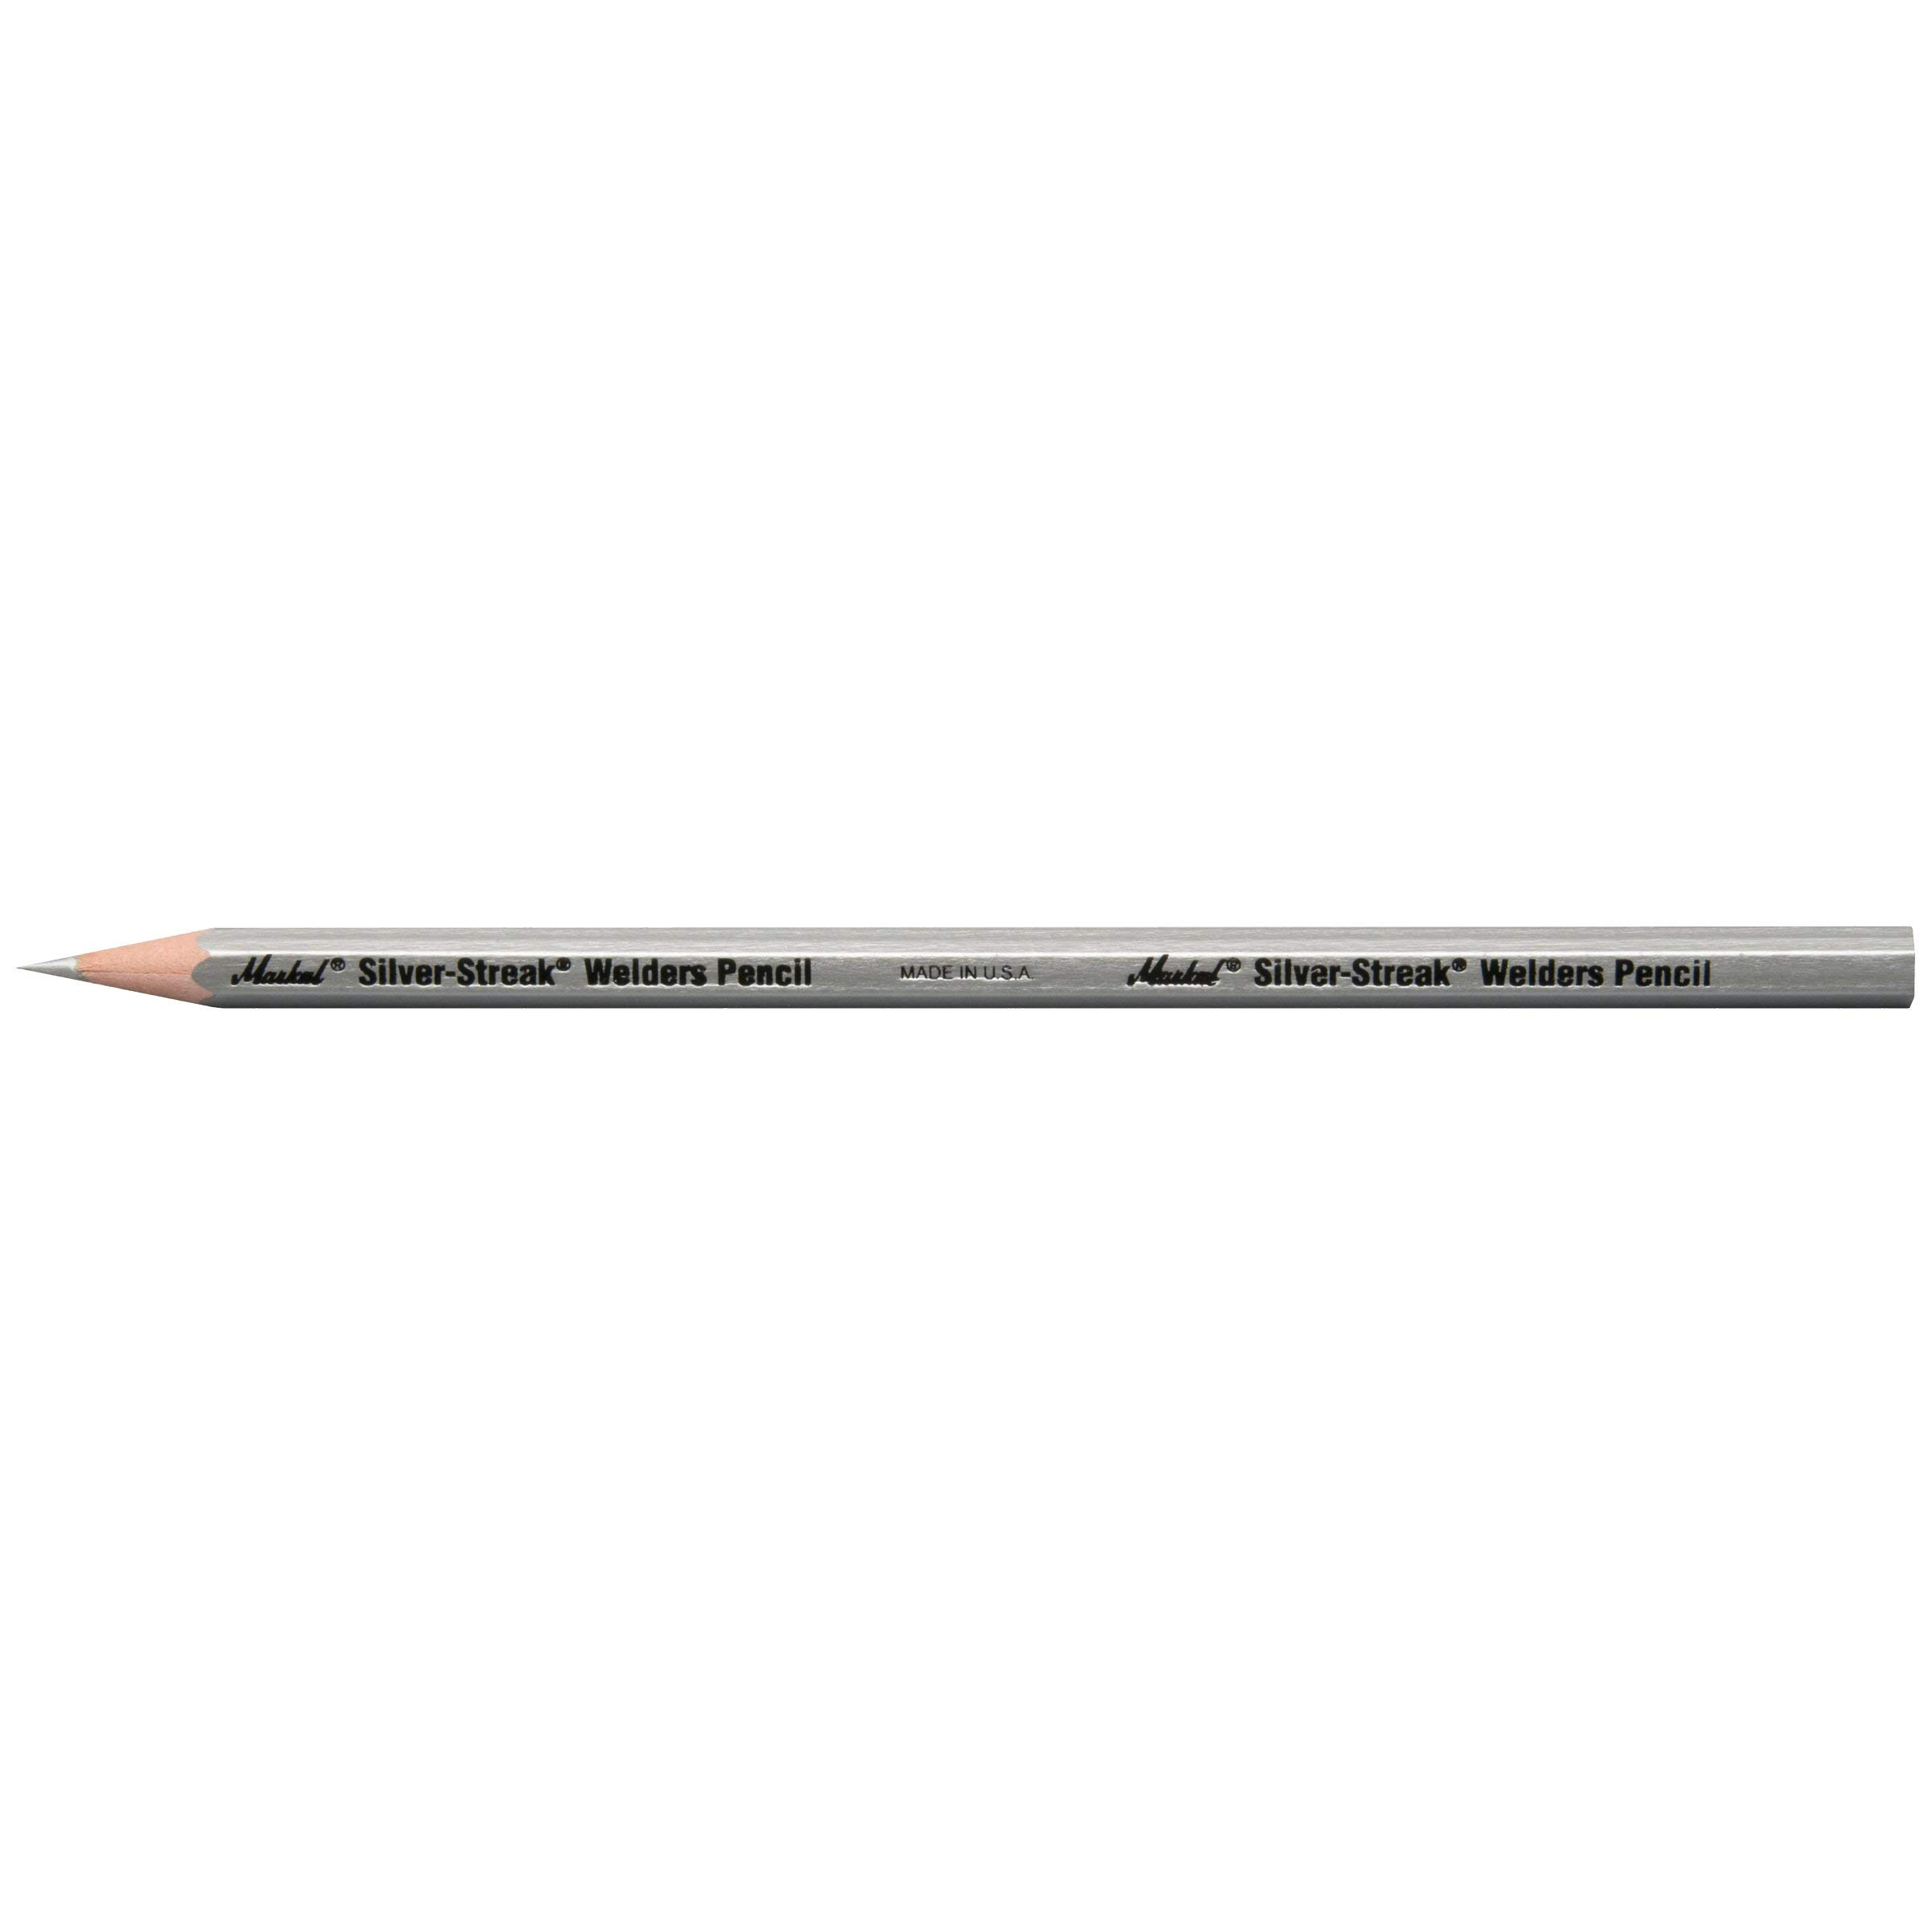 Markal 96101 Silver Streak Welders Pencil, Silver (Pack of 12)[New Improved Version] by Markal